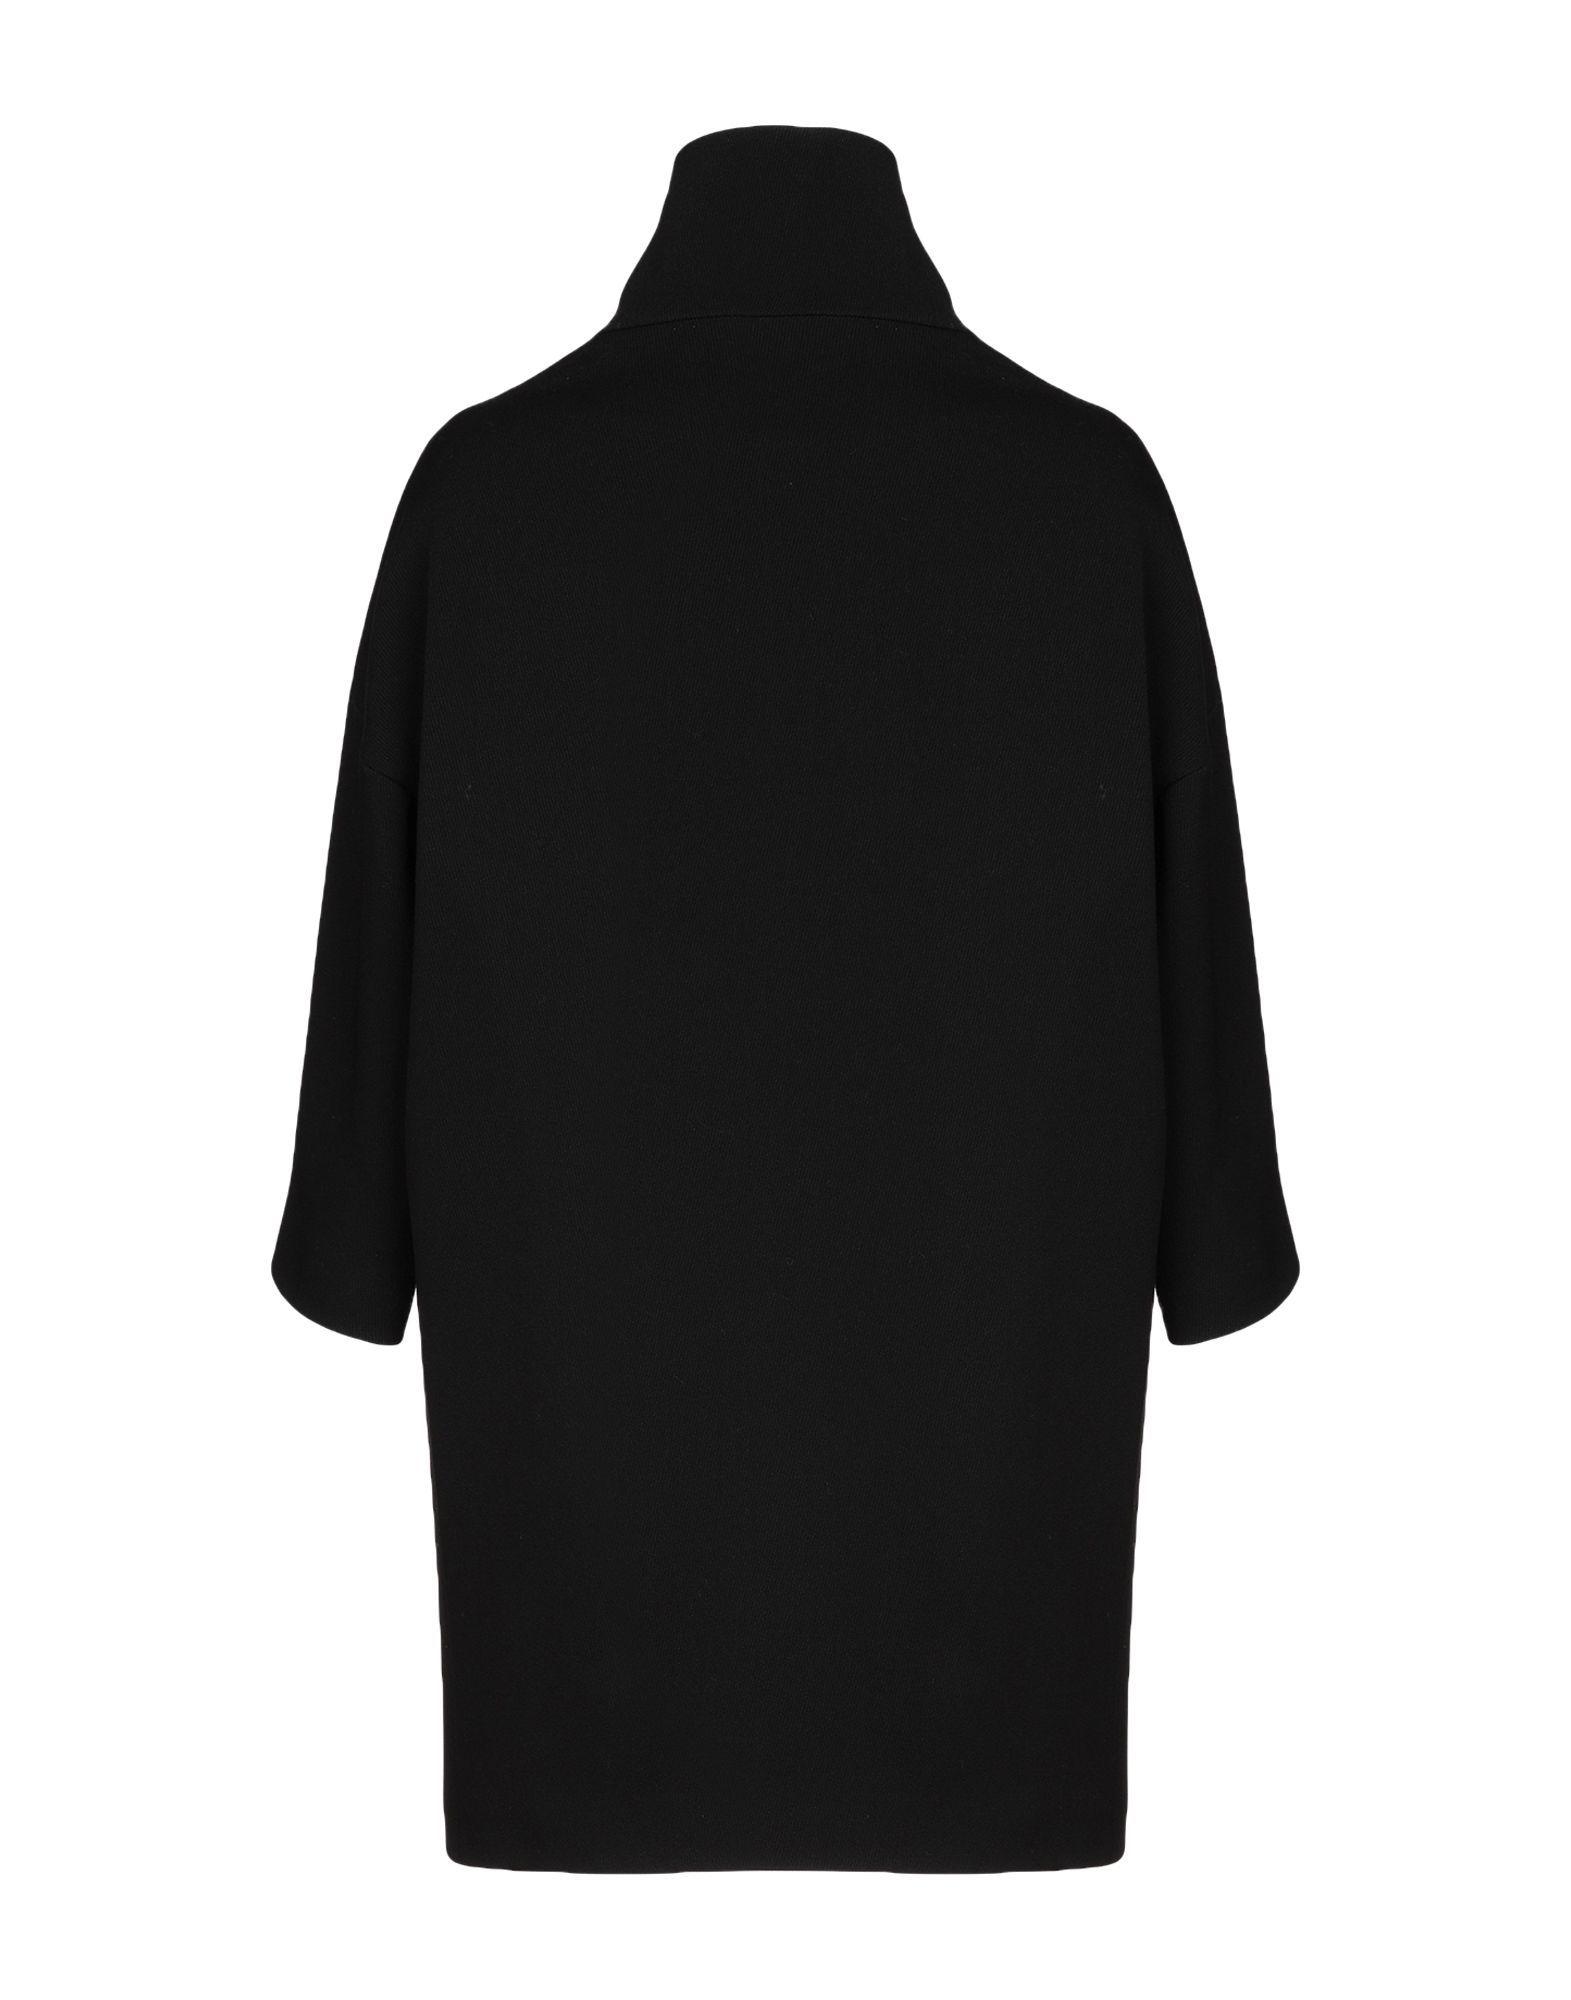 COATS & JACKETS Annie P. Black Woman Virgin Wool